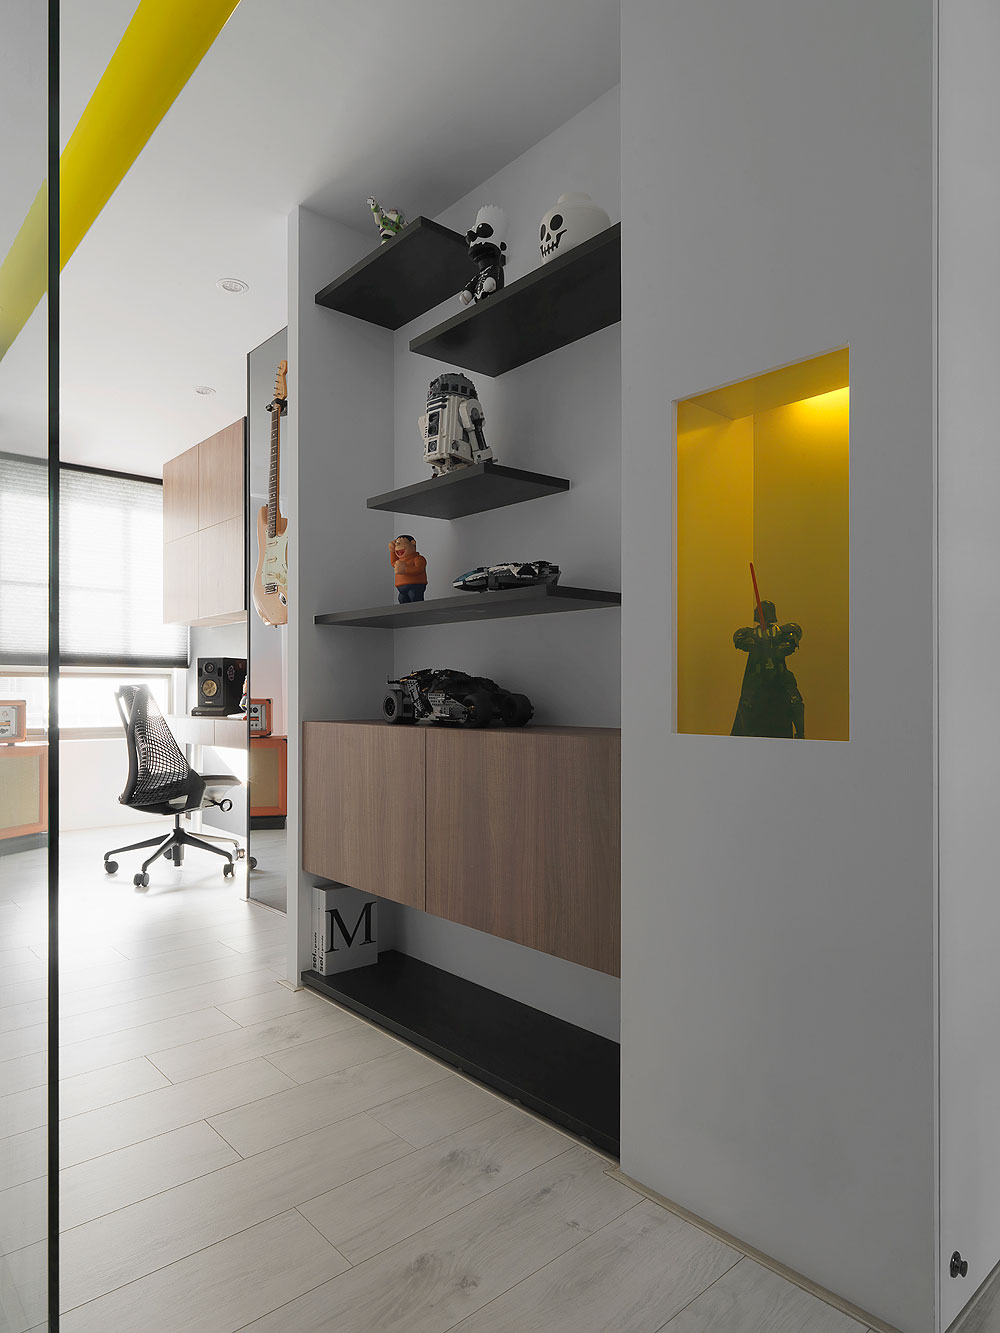 h-residence-z-axis-design (12)